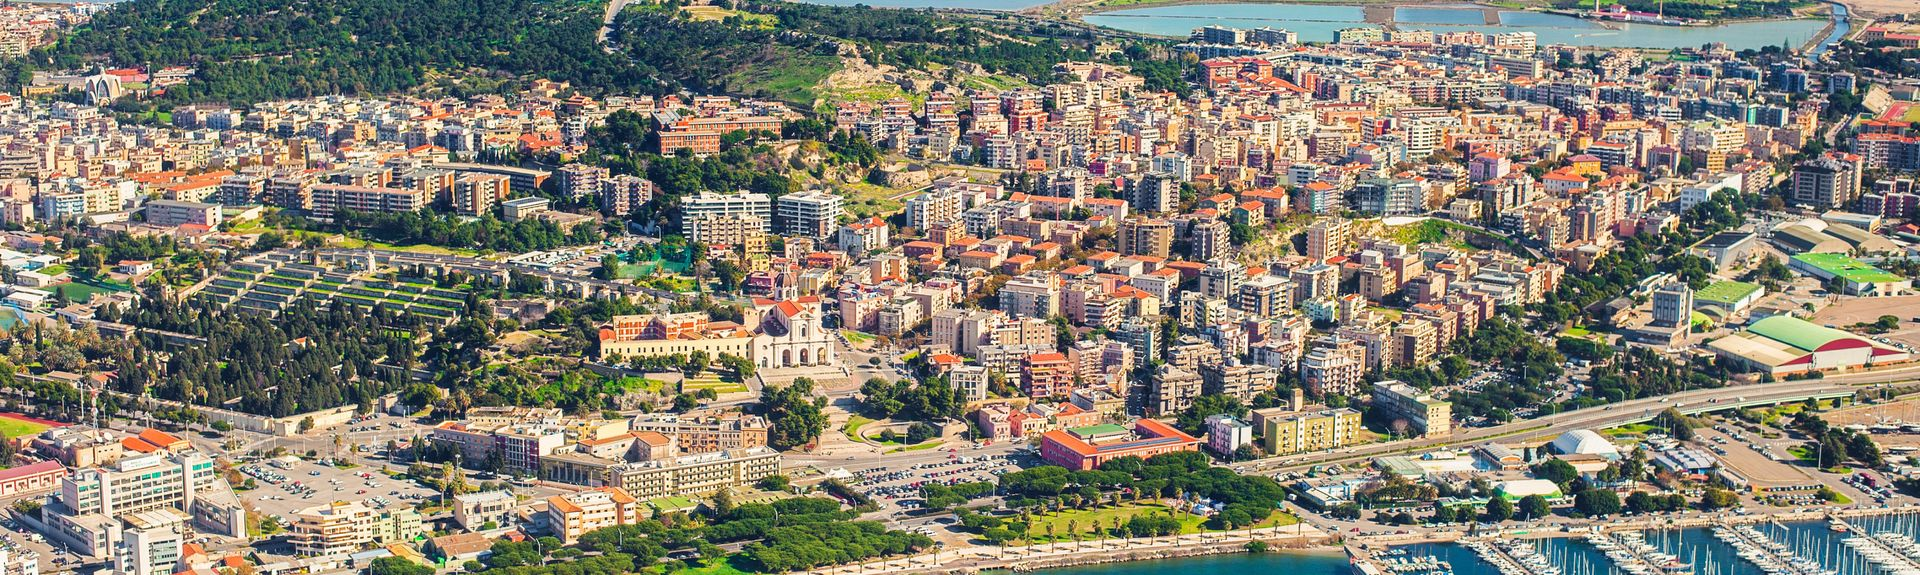 Cagliari, Sardenha, Itália